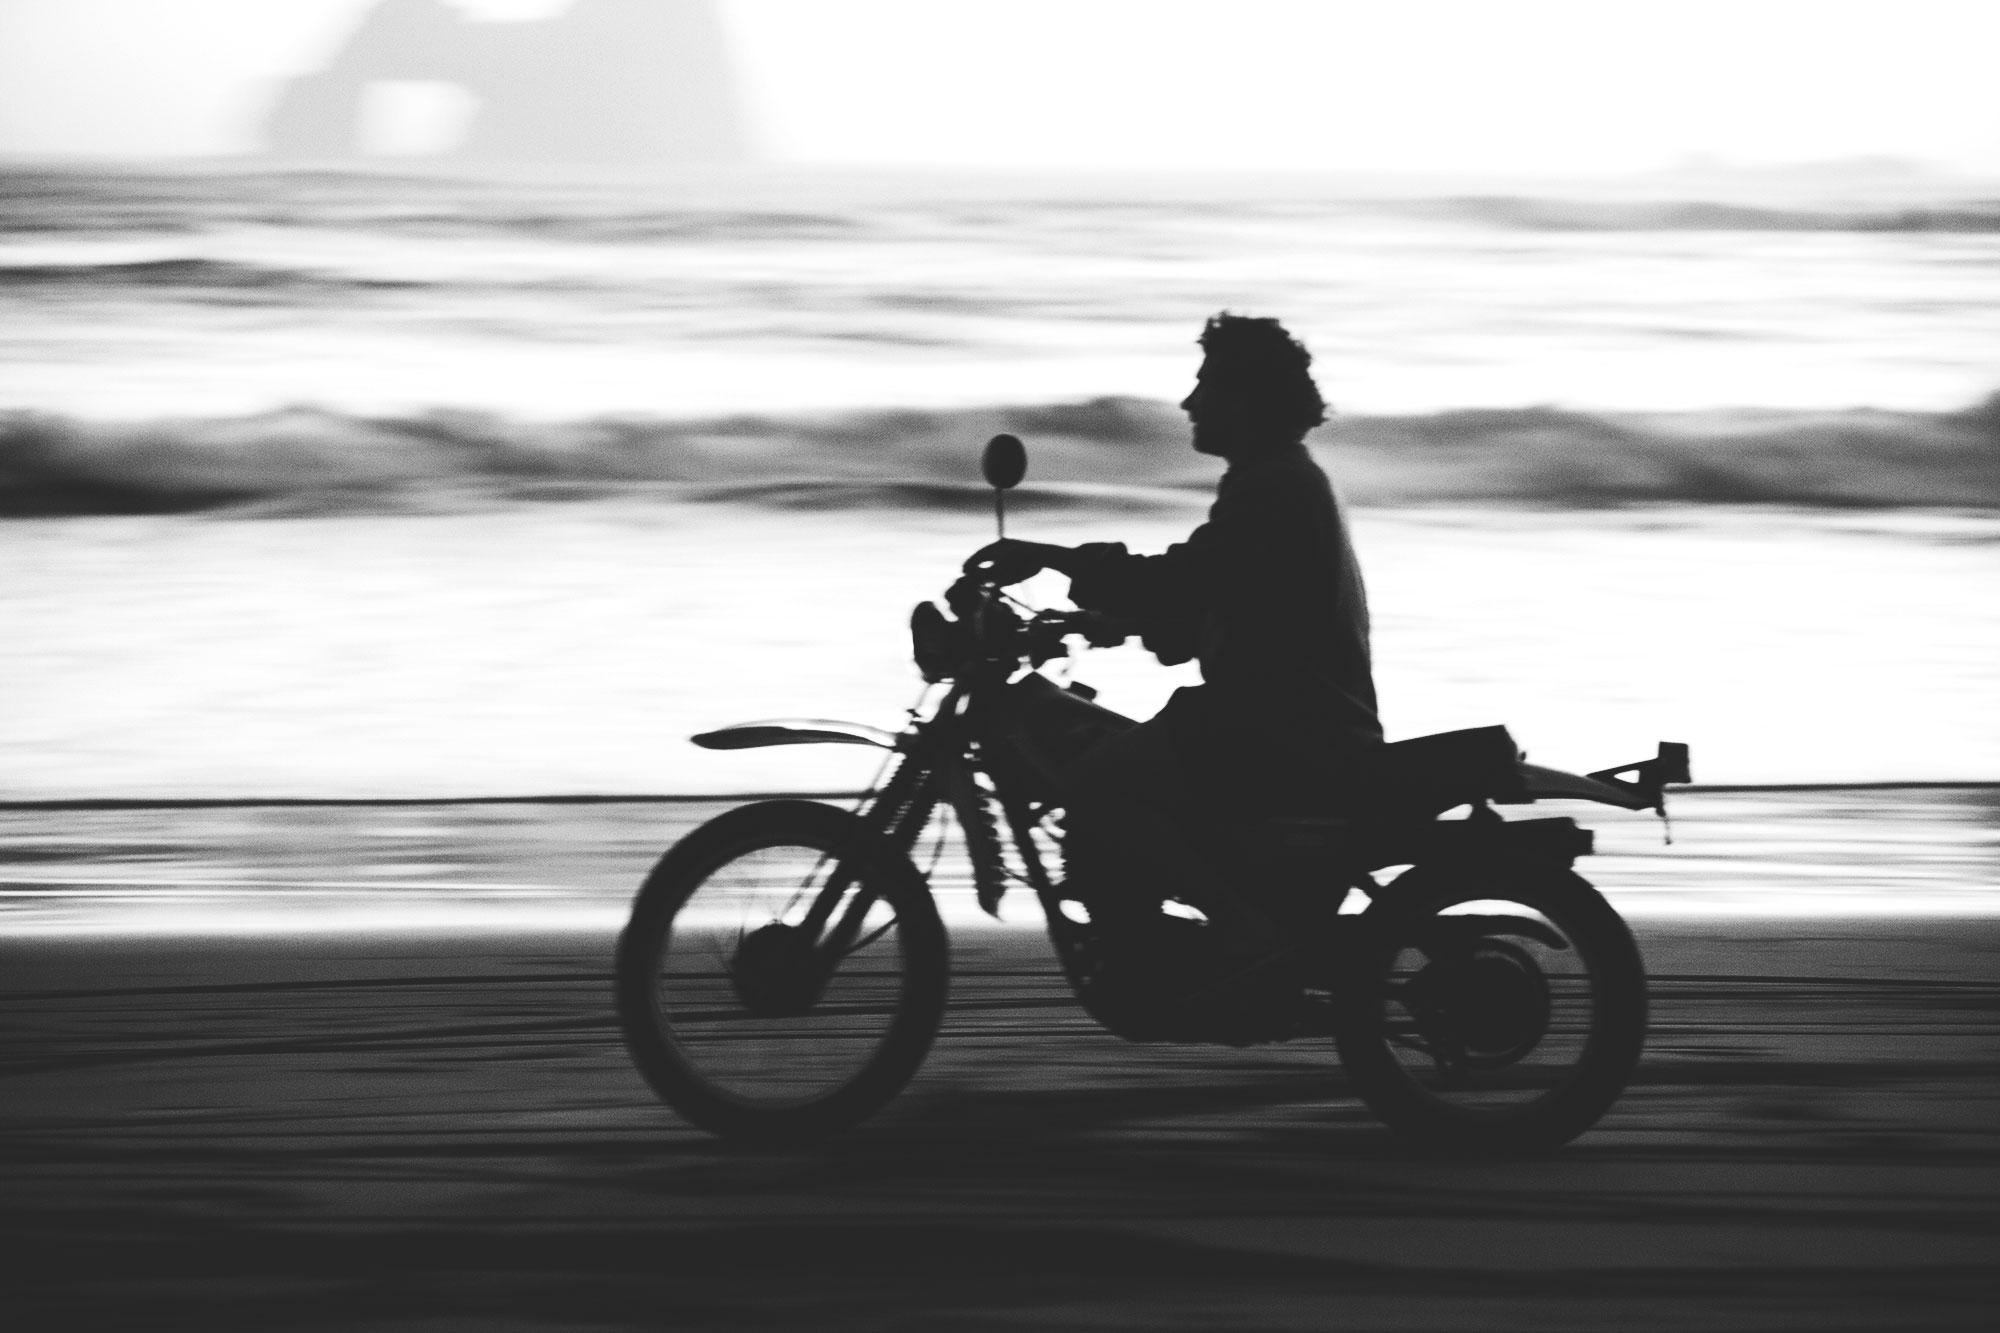 5_patrick_motorbikebeach_bw_web.jpg